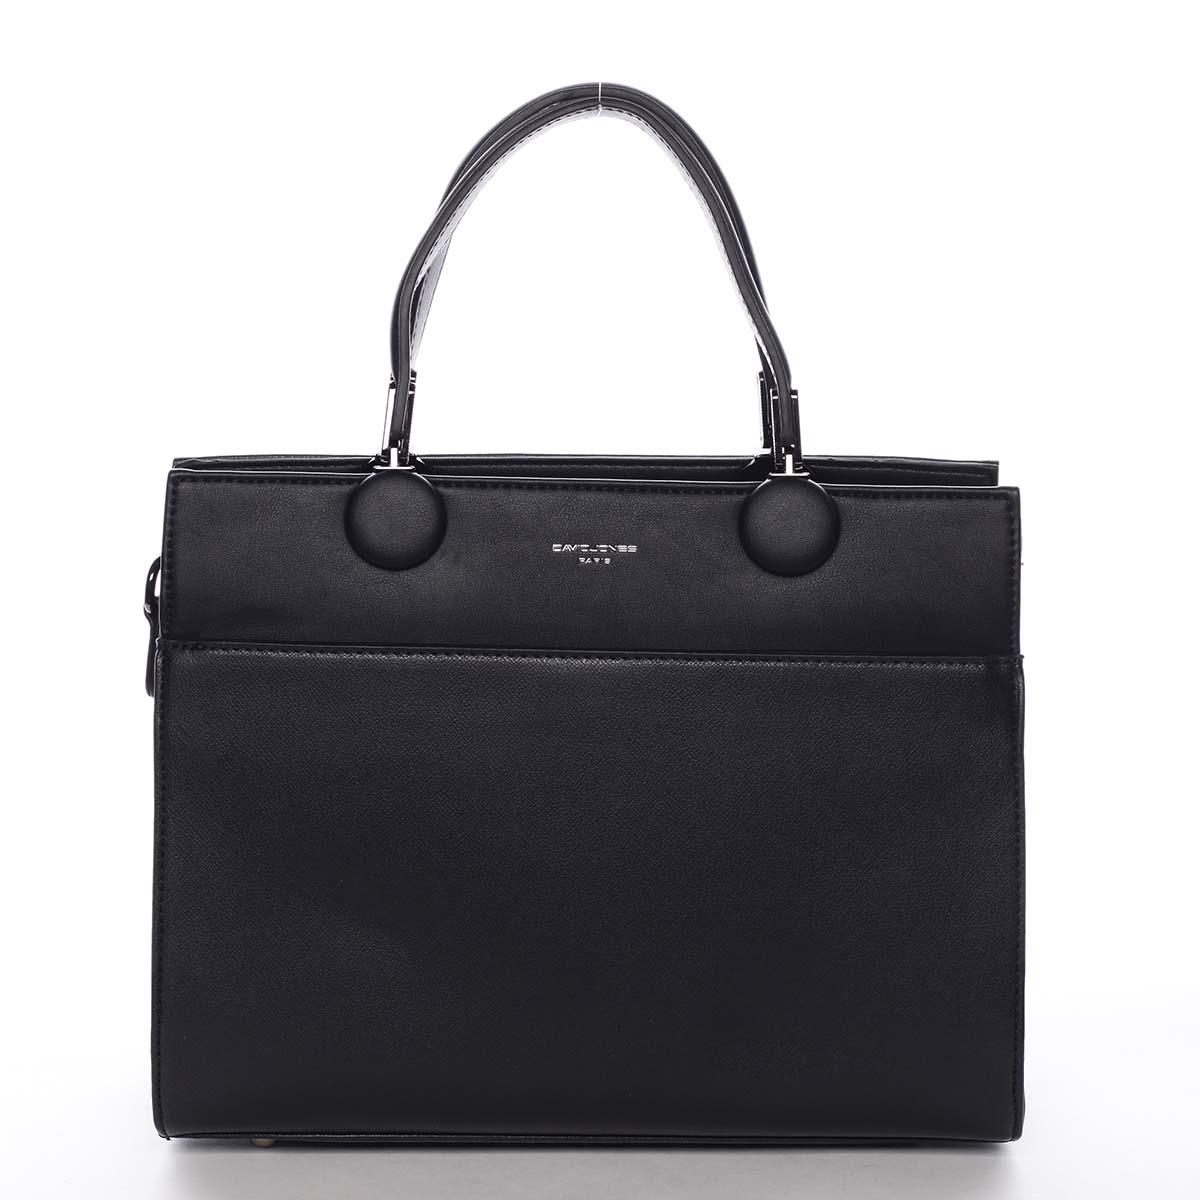 Dámská kabelka do ruky černá - David Jones Edma